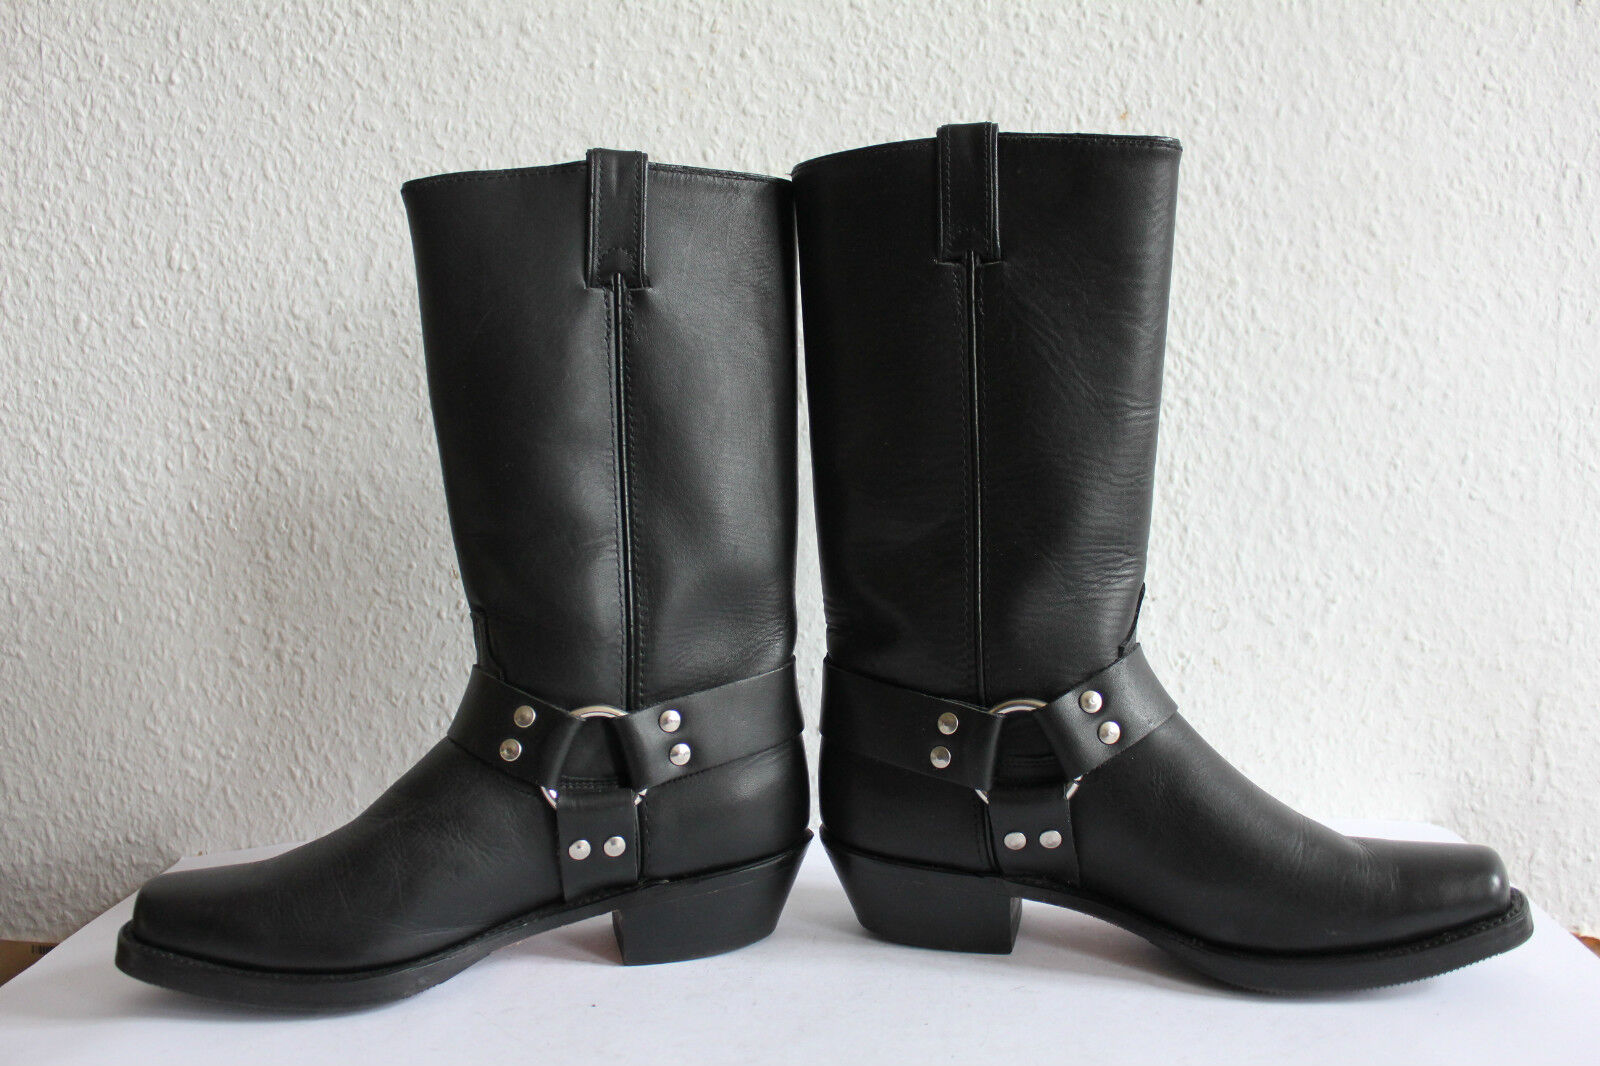 Code west Biker Bottes COW-BOY high bottes véritable cuir noir us 9 M made in usa